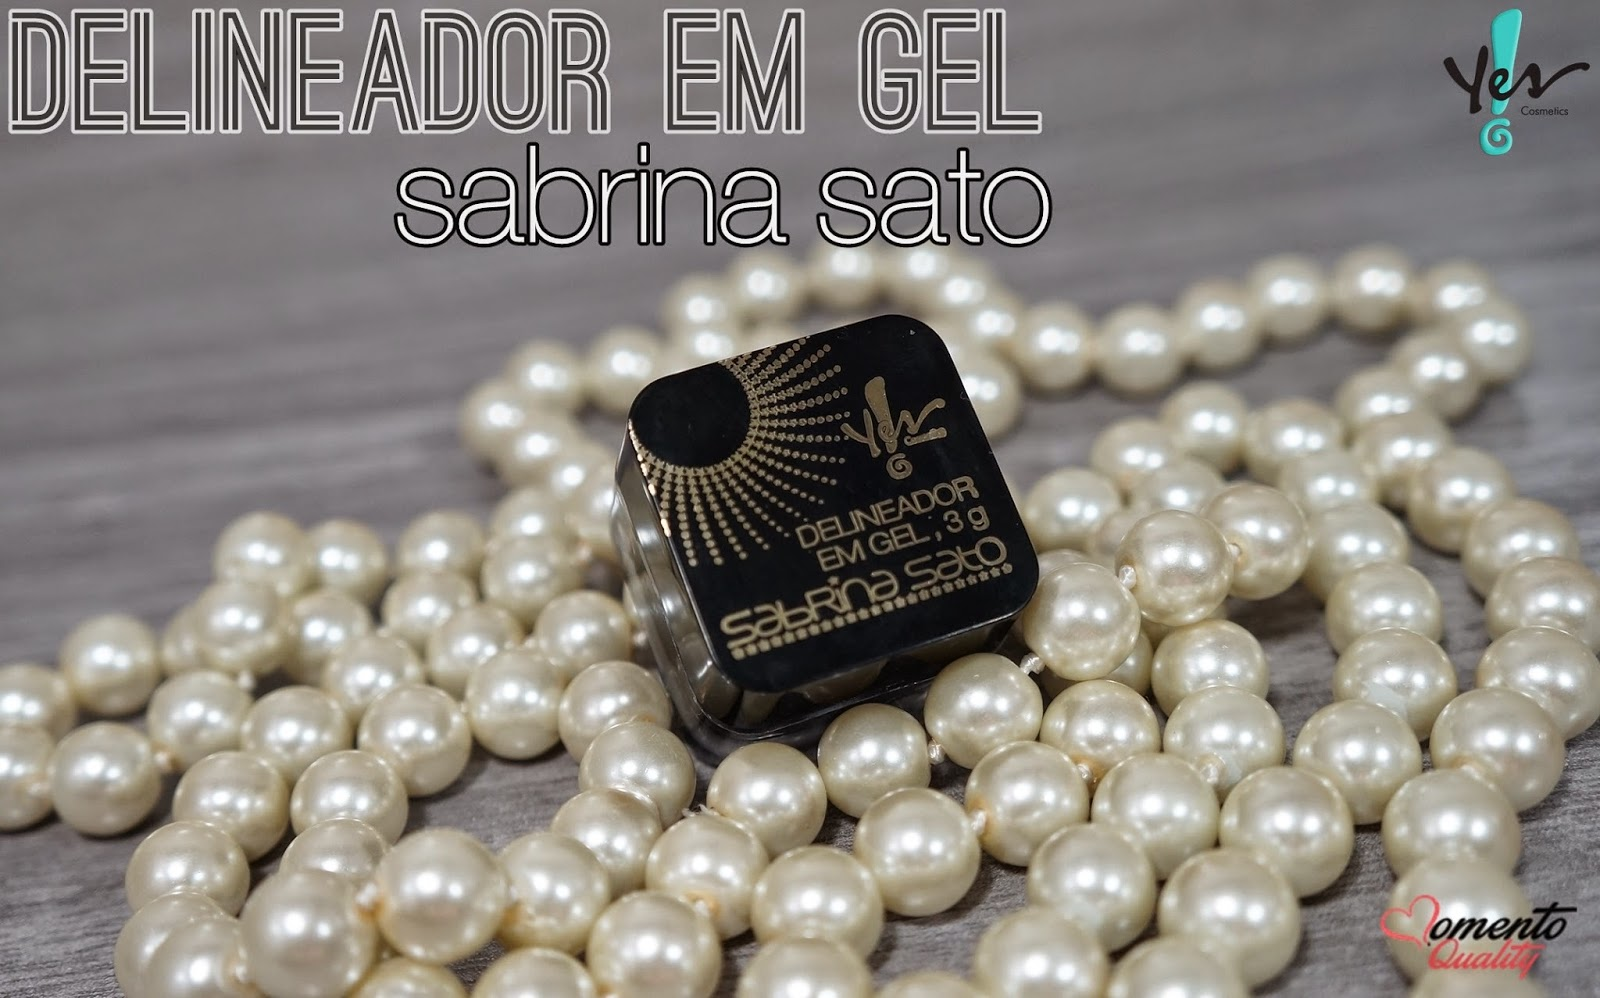 Delineador em Gel Sabrina Sato Preto